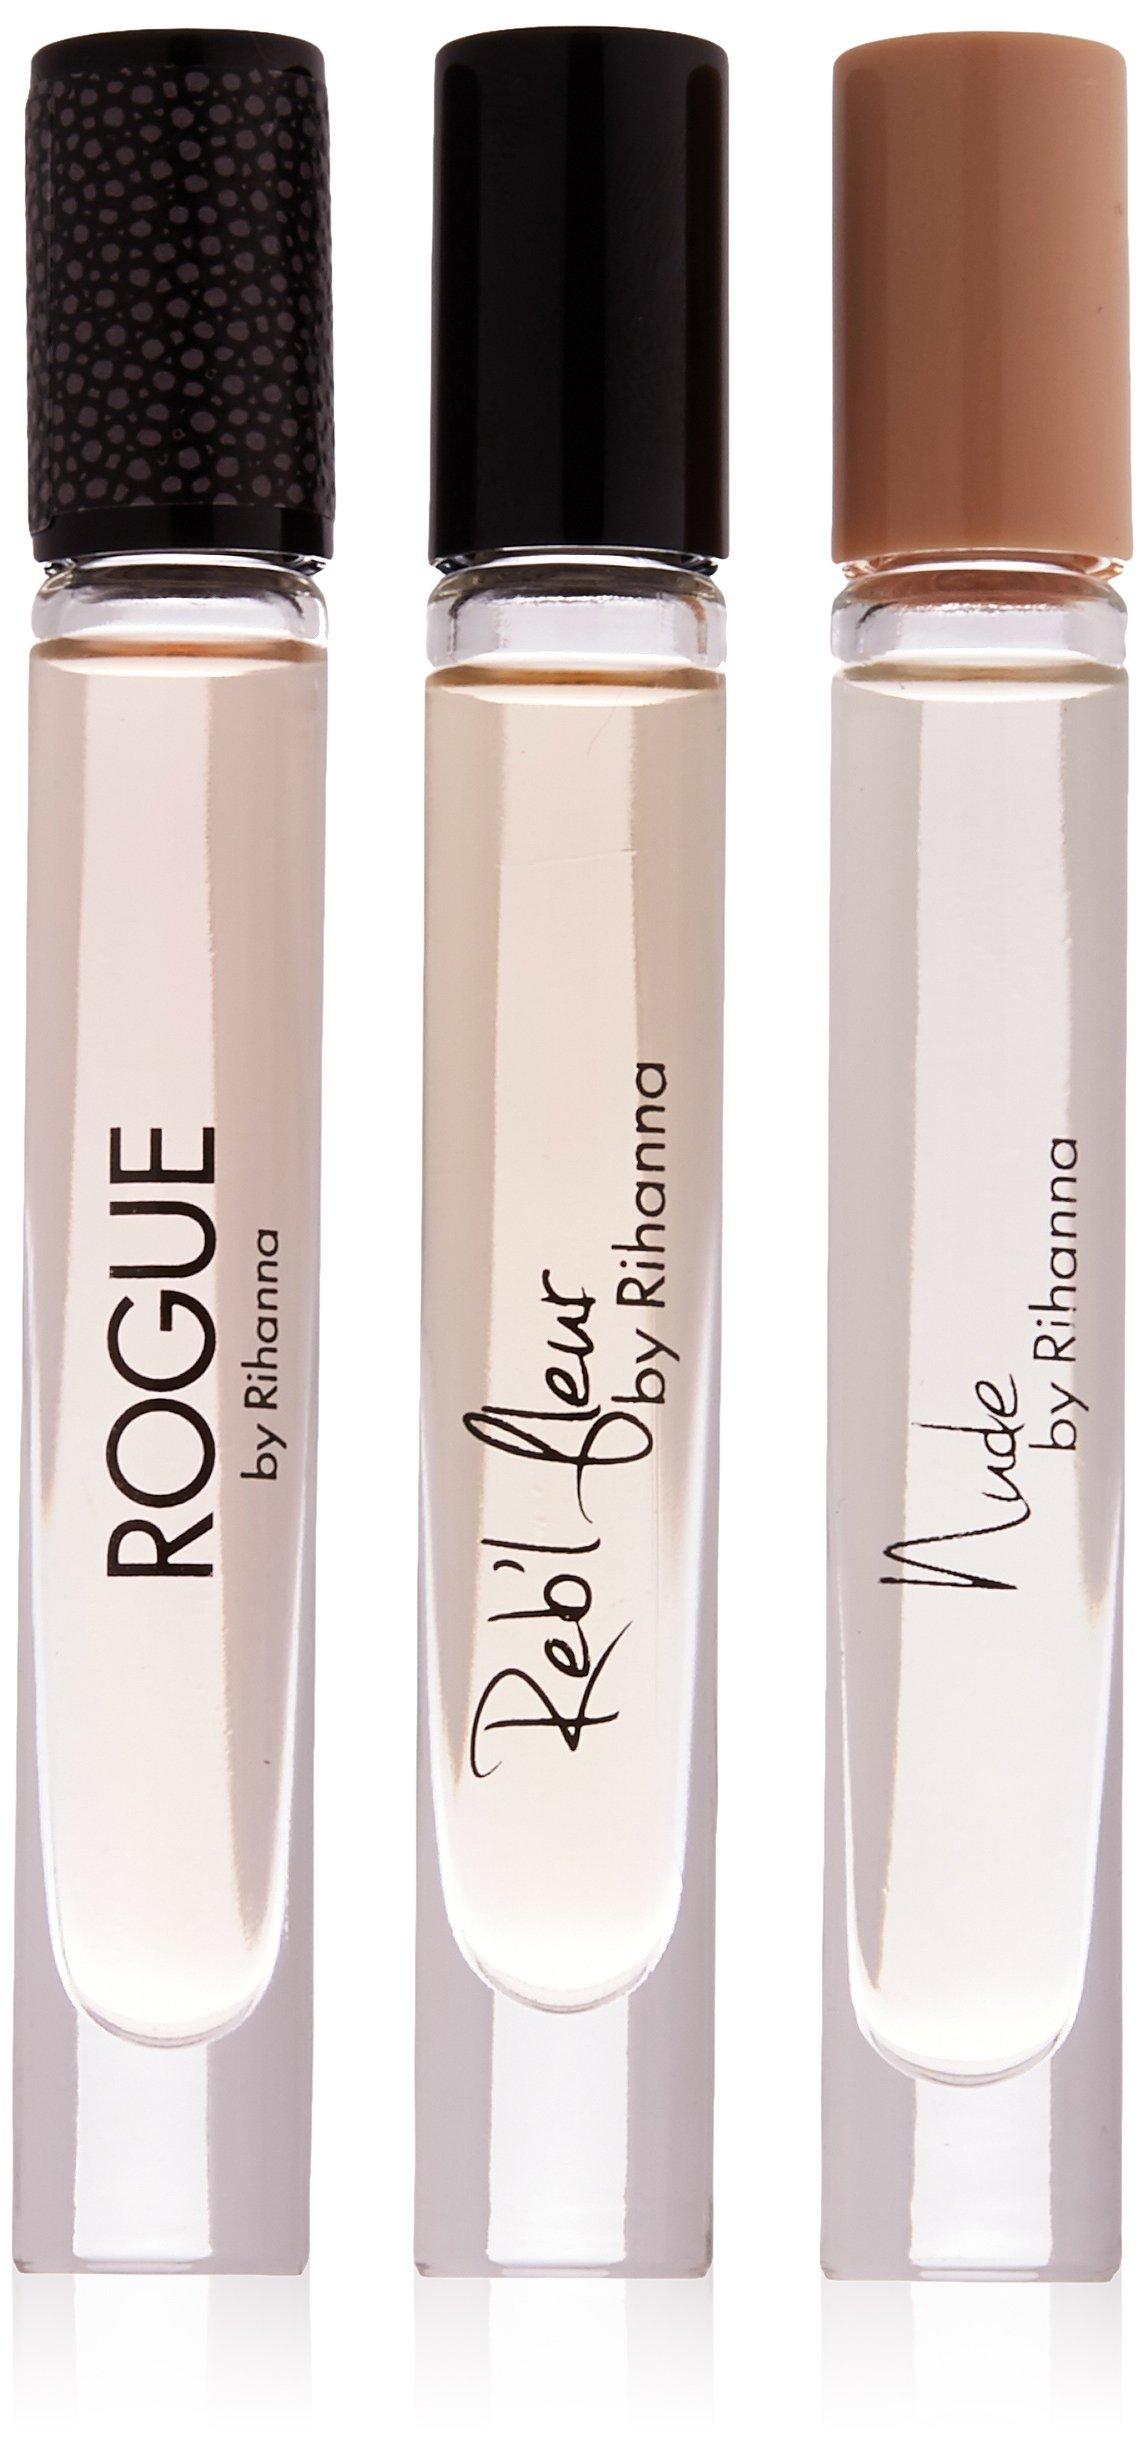 Rihanna Fragrance 3 Piece Gift Set by Rihanna